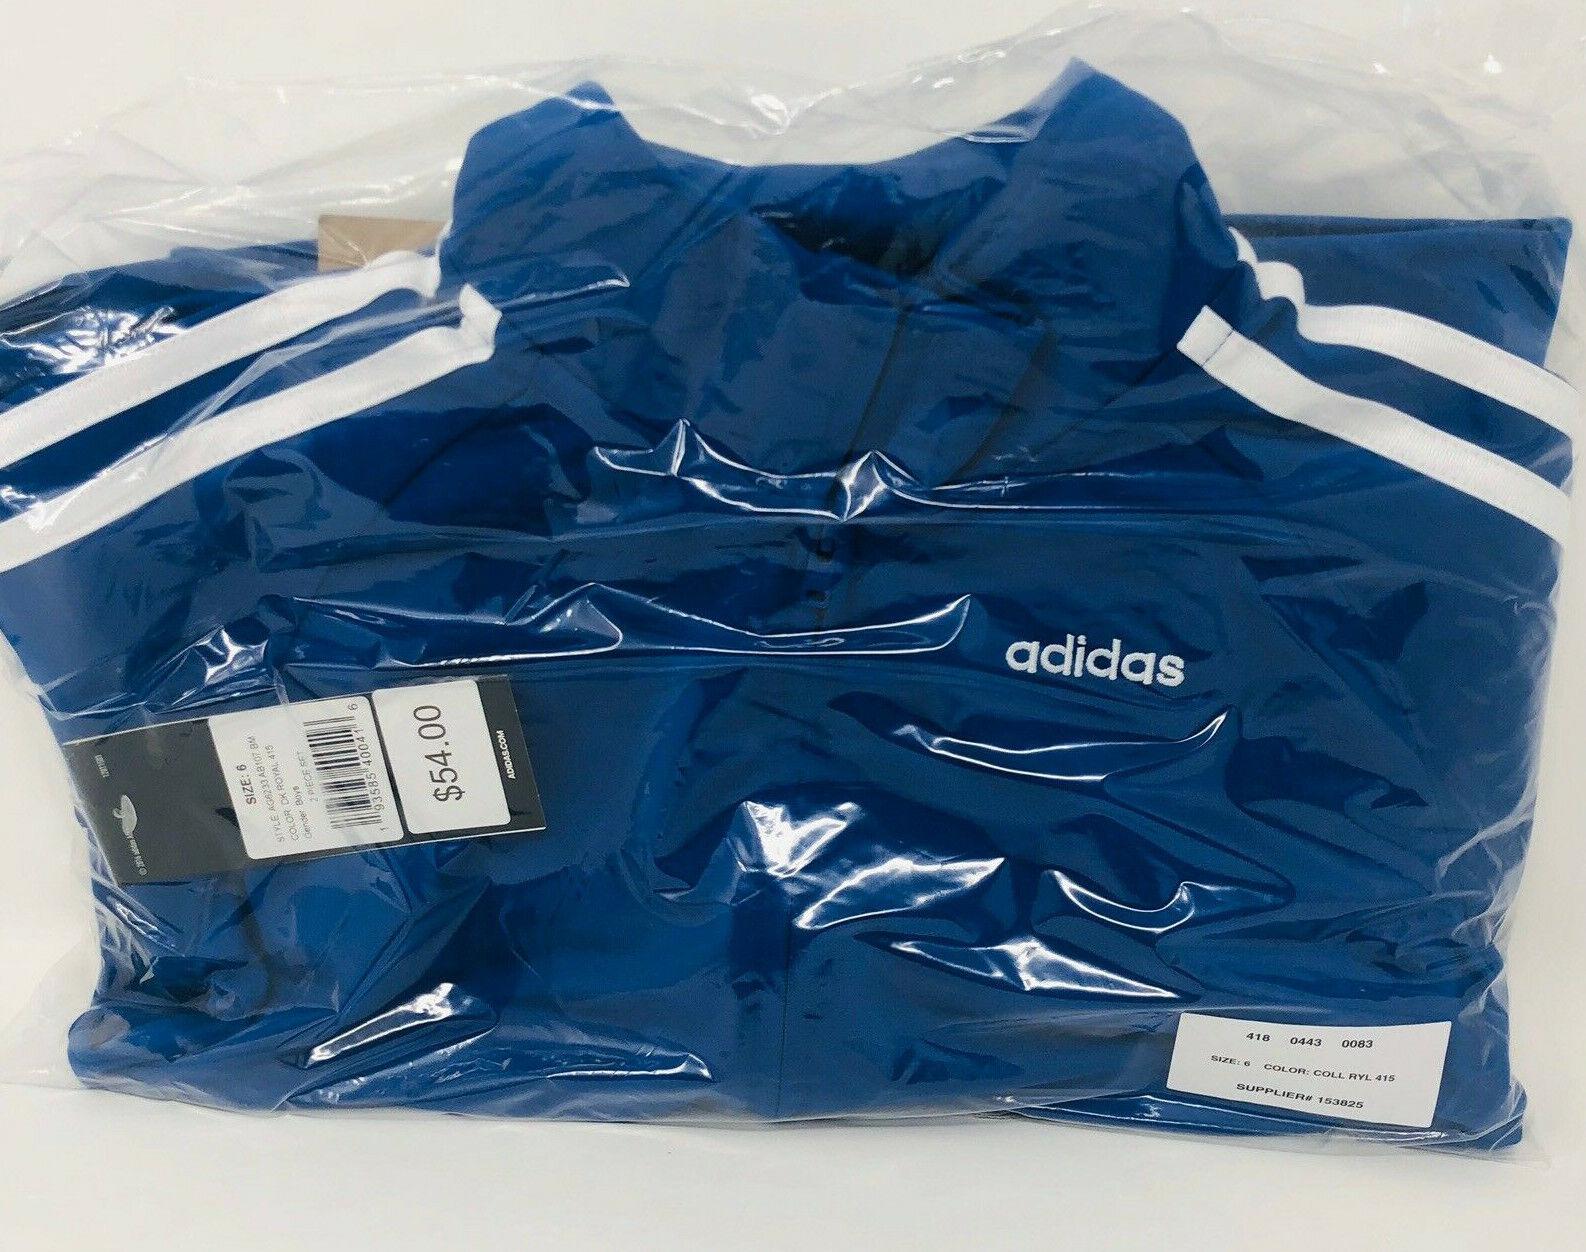 $54 New Adidas 2 Piece Track Suit Size 6 Little Kid Boys Jac